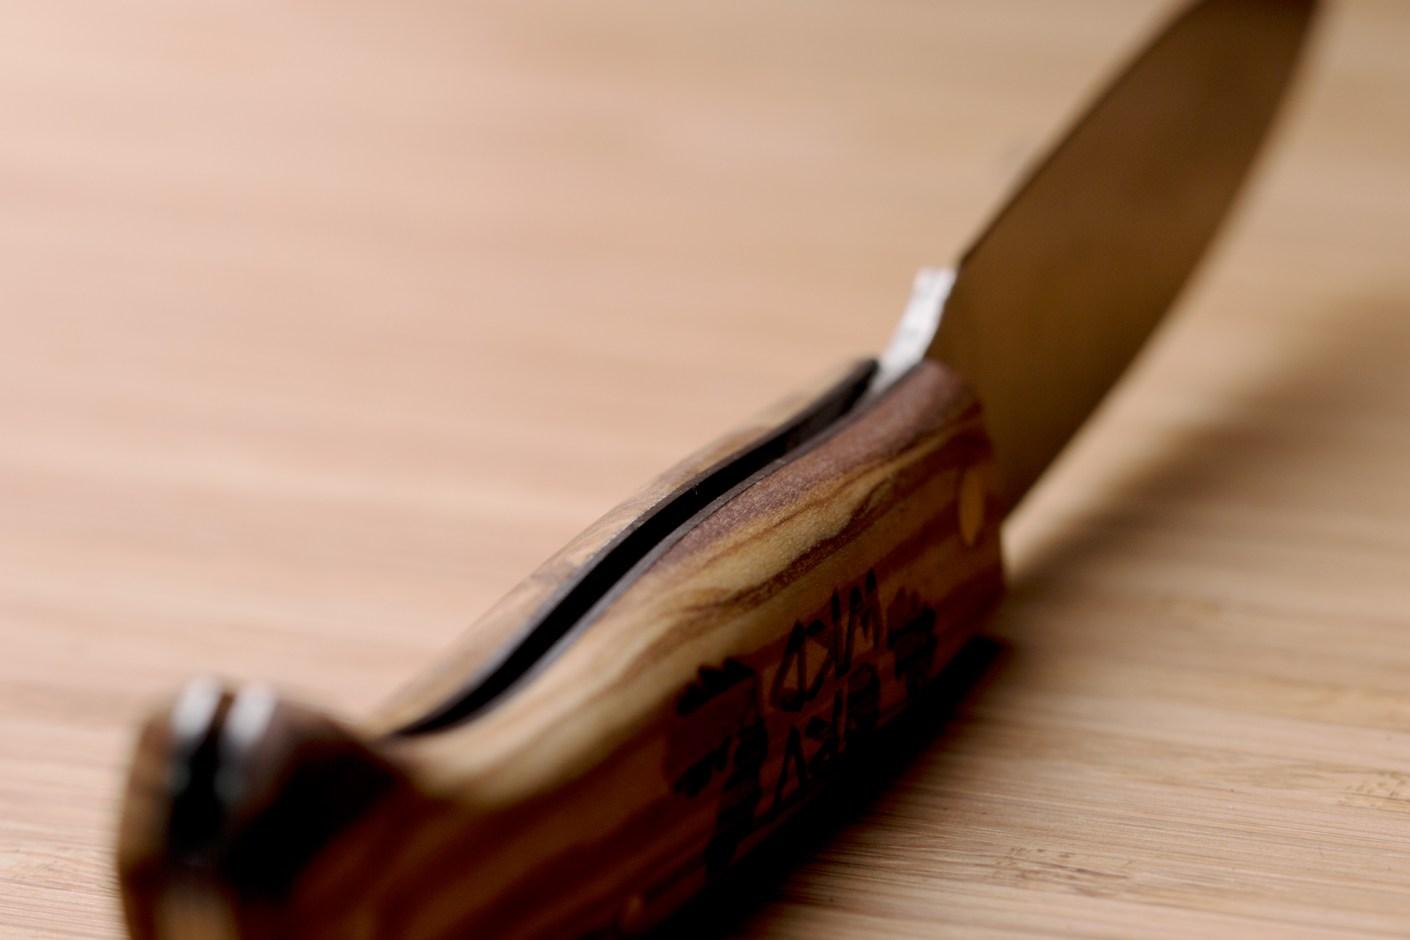 Image of Carhartt WIP x CRV WKD Knife